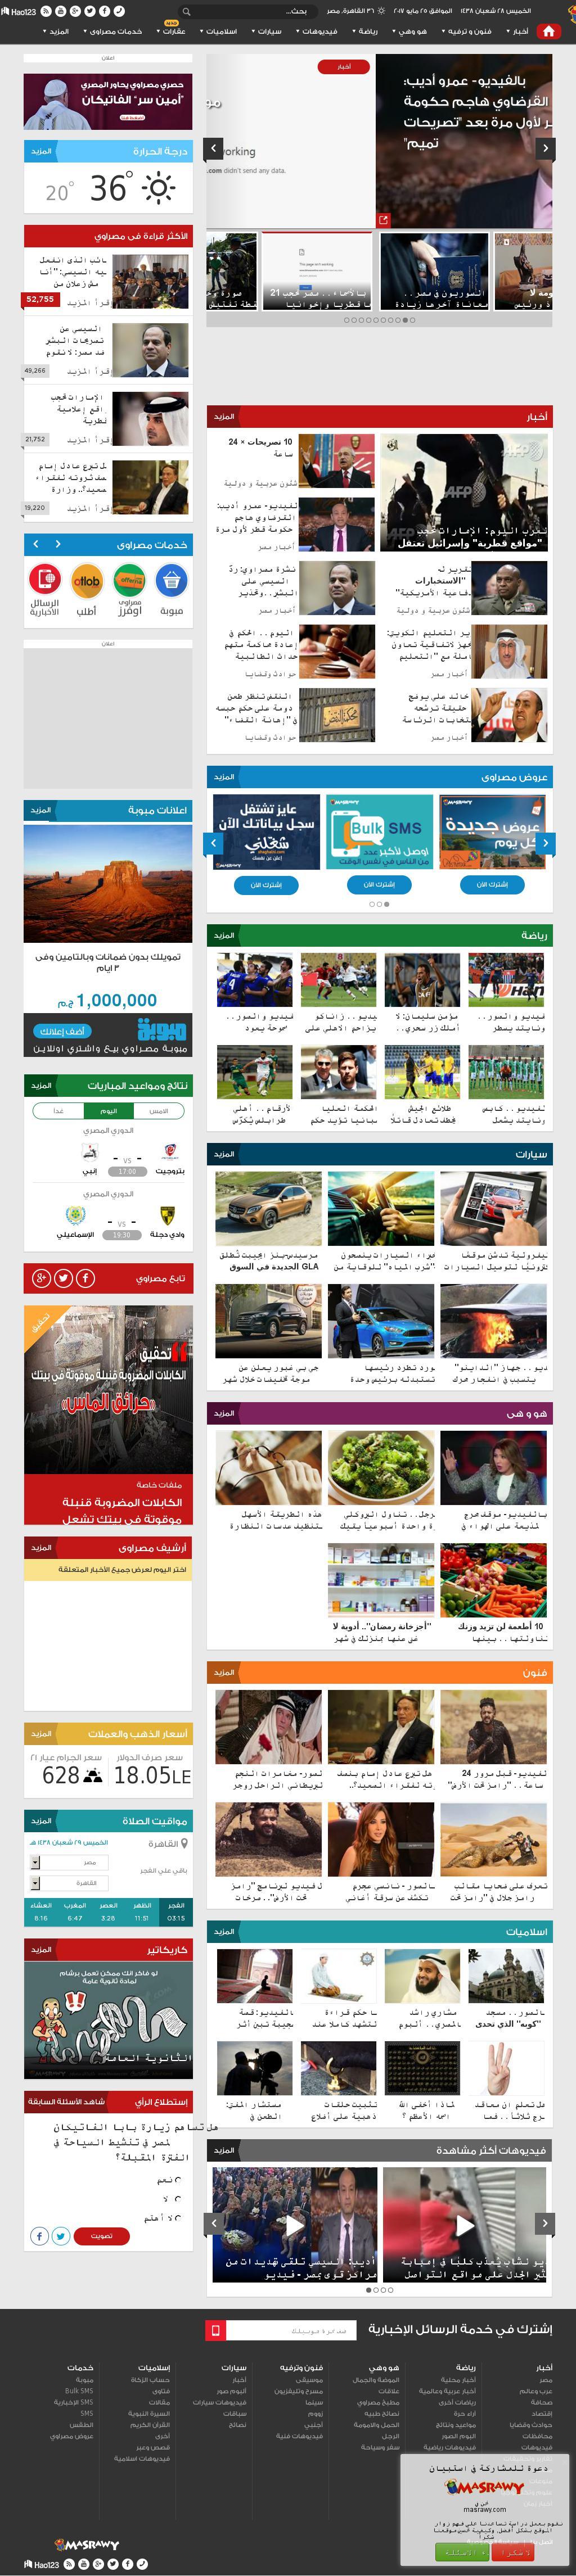 Masrawy at Wednesday May 24, 2017, 11:15 p.m. UTC